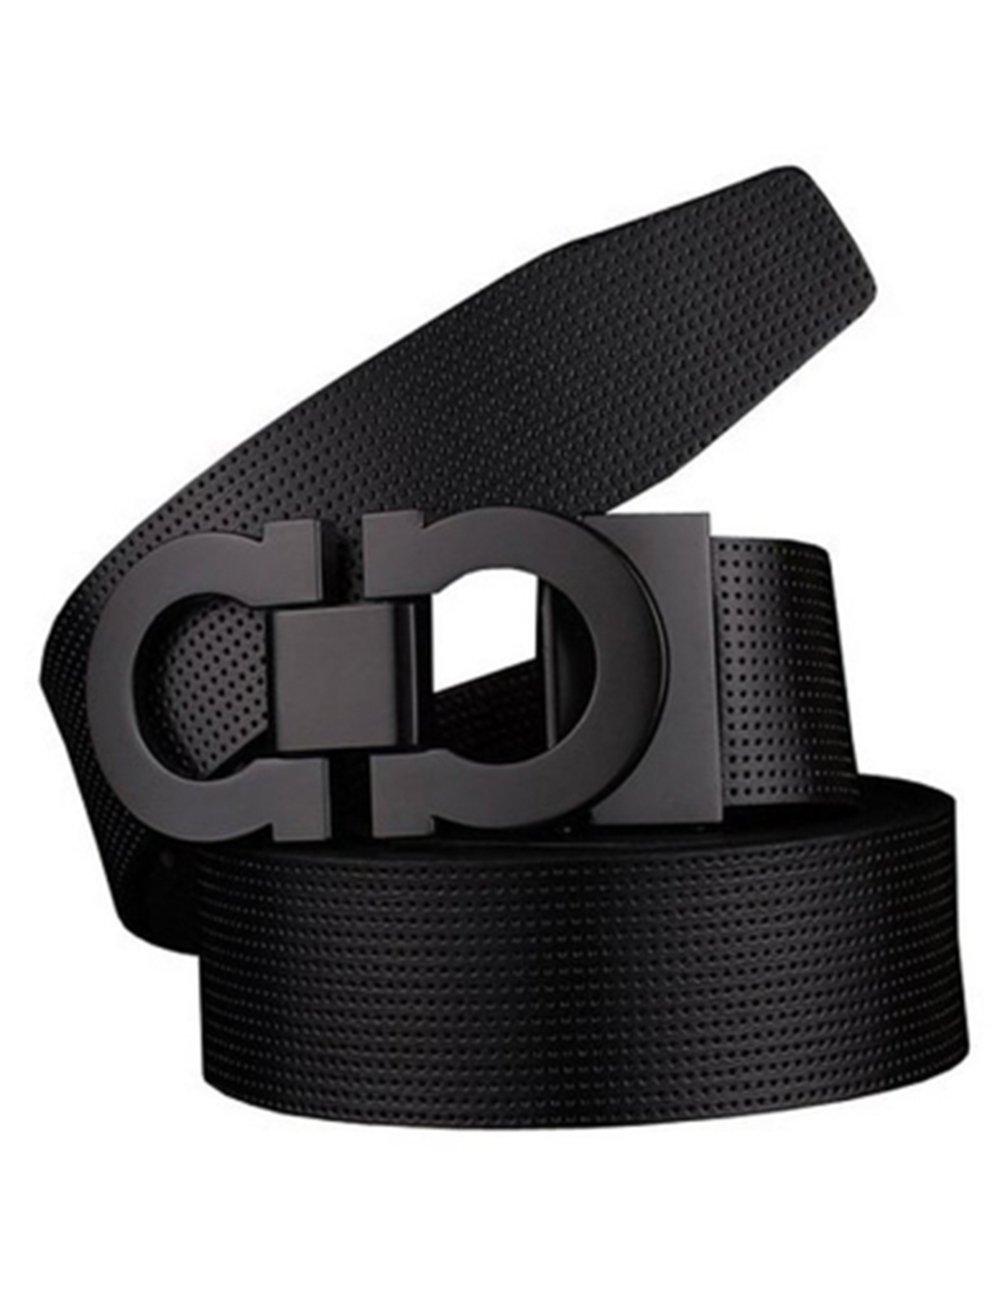 Men's Smooth Leather Buckle Belt 35mm Leather up to 42inch (105-115cm for Choose) 110cm Black-Black